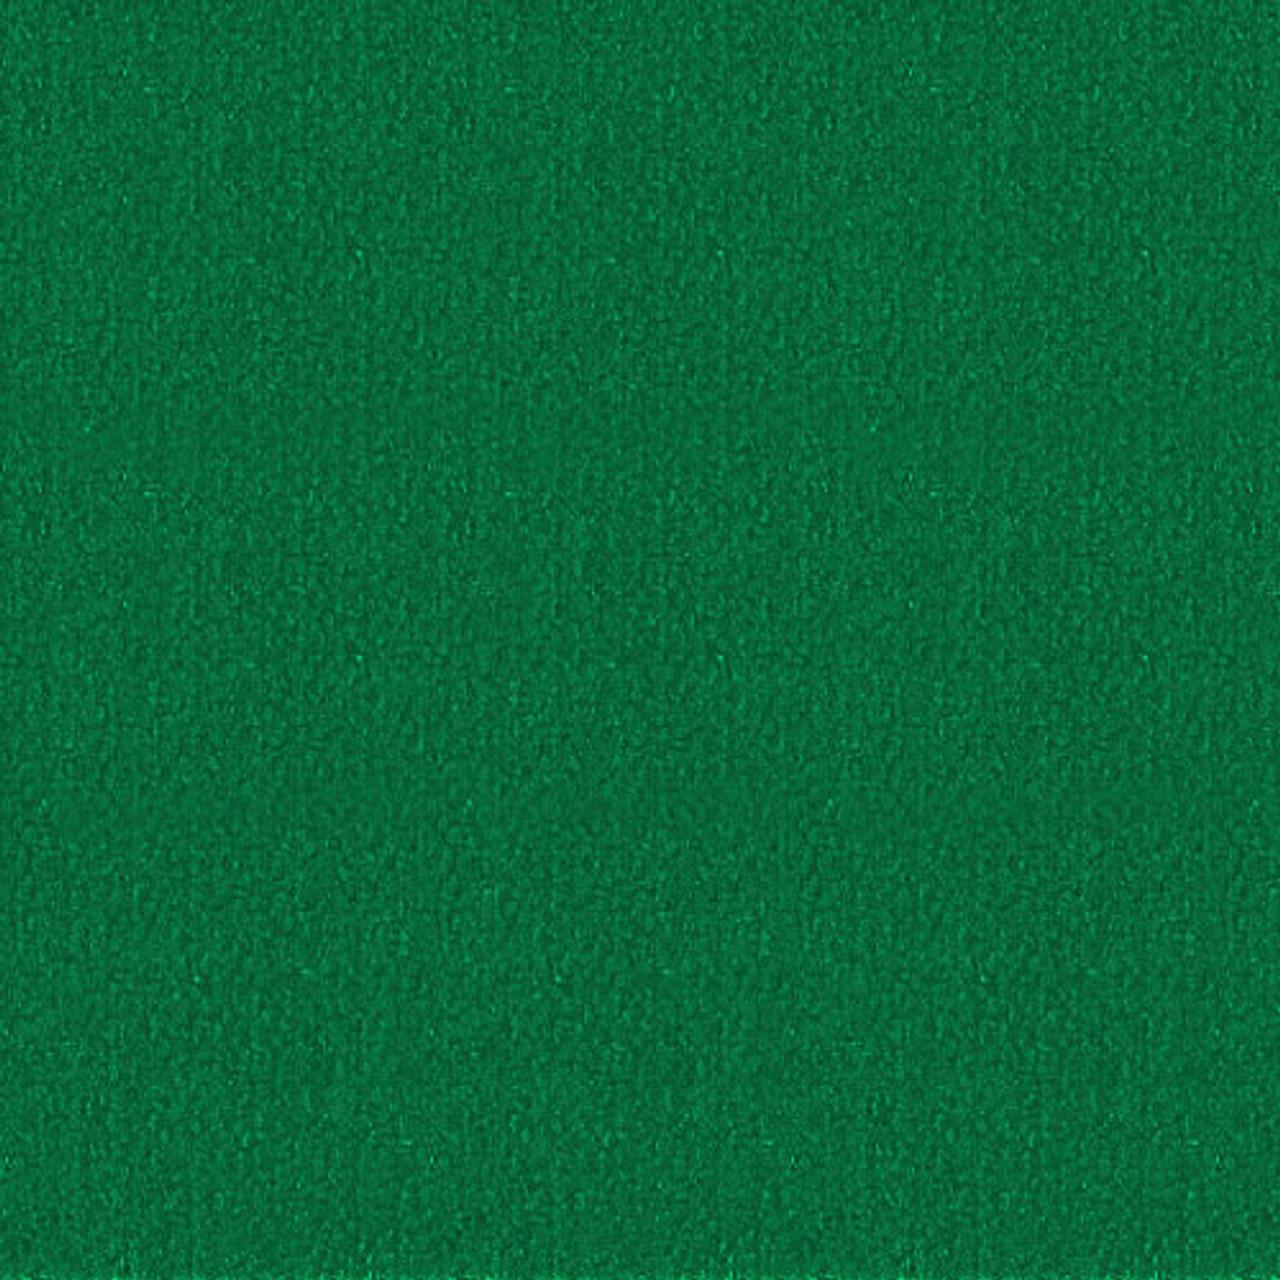 Championship Green 8ft Invitational Pool Table Felt - Ozone Billiards